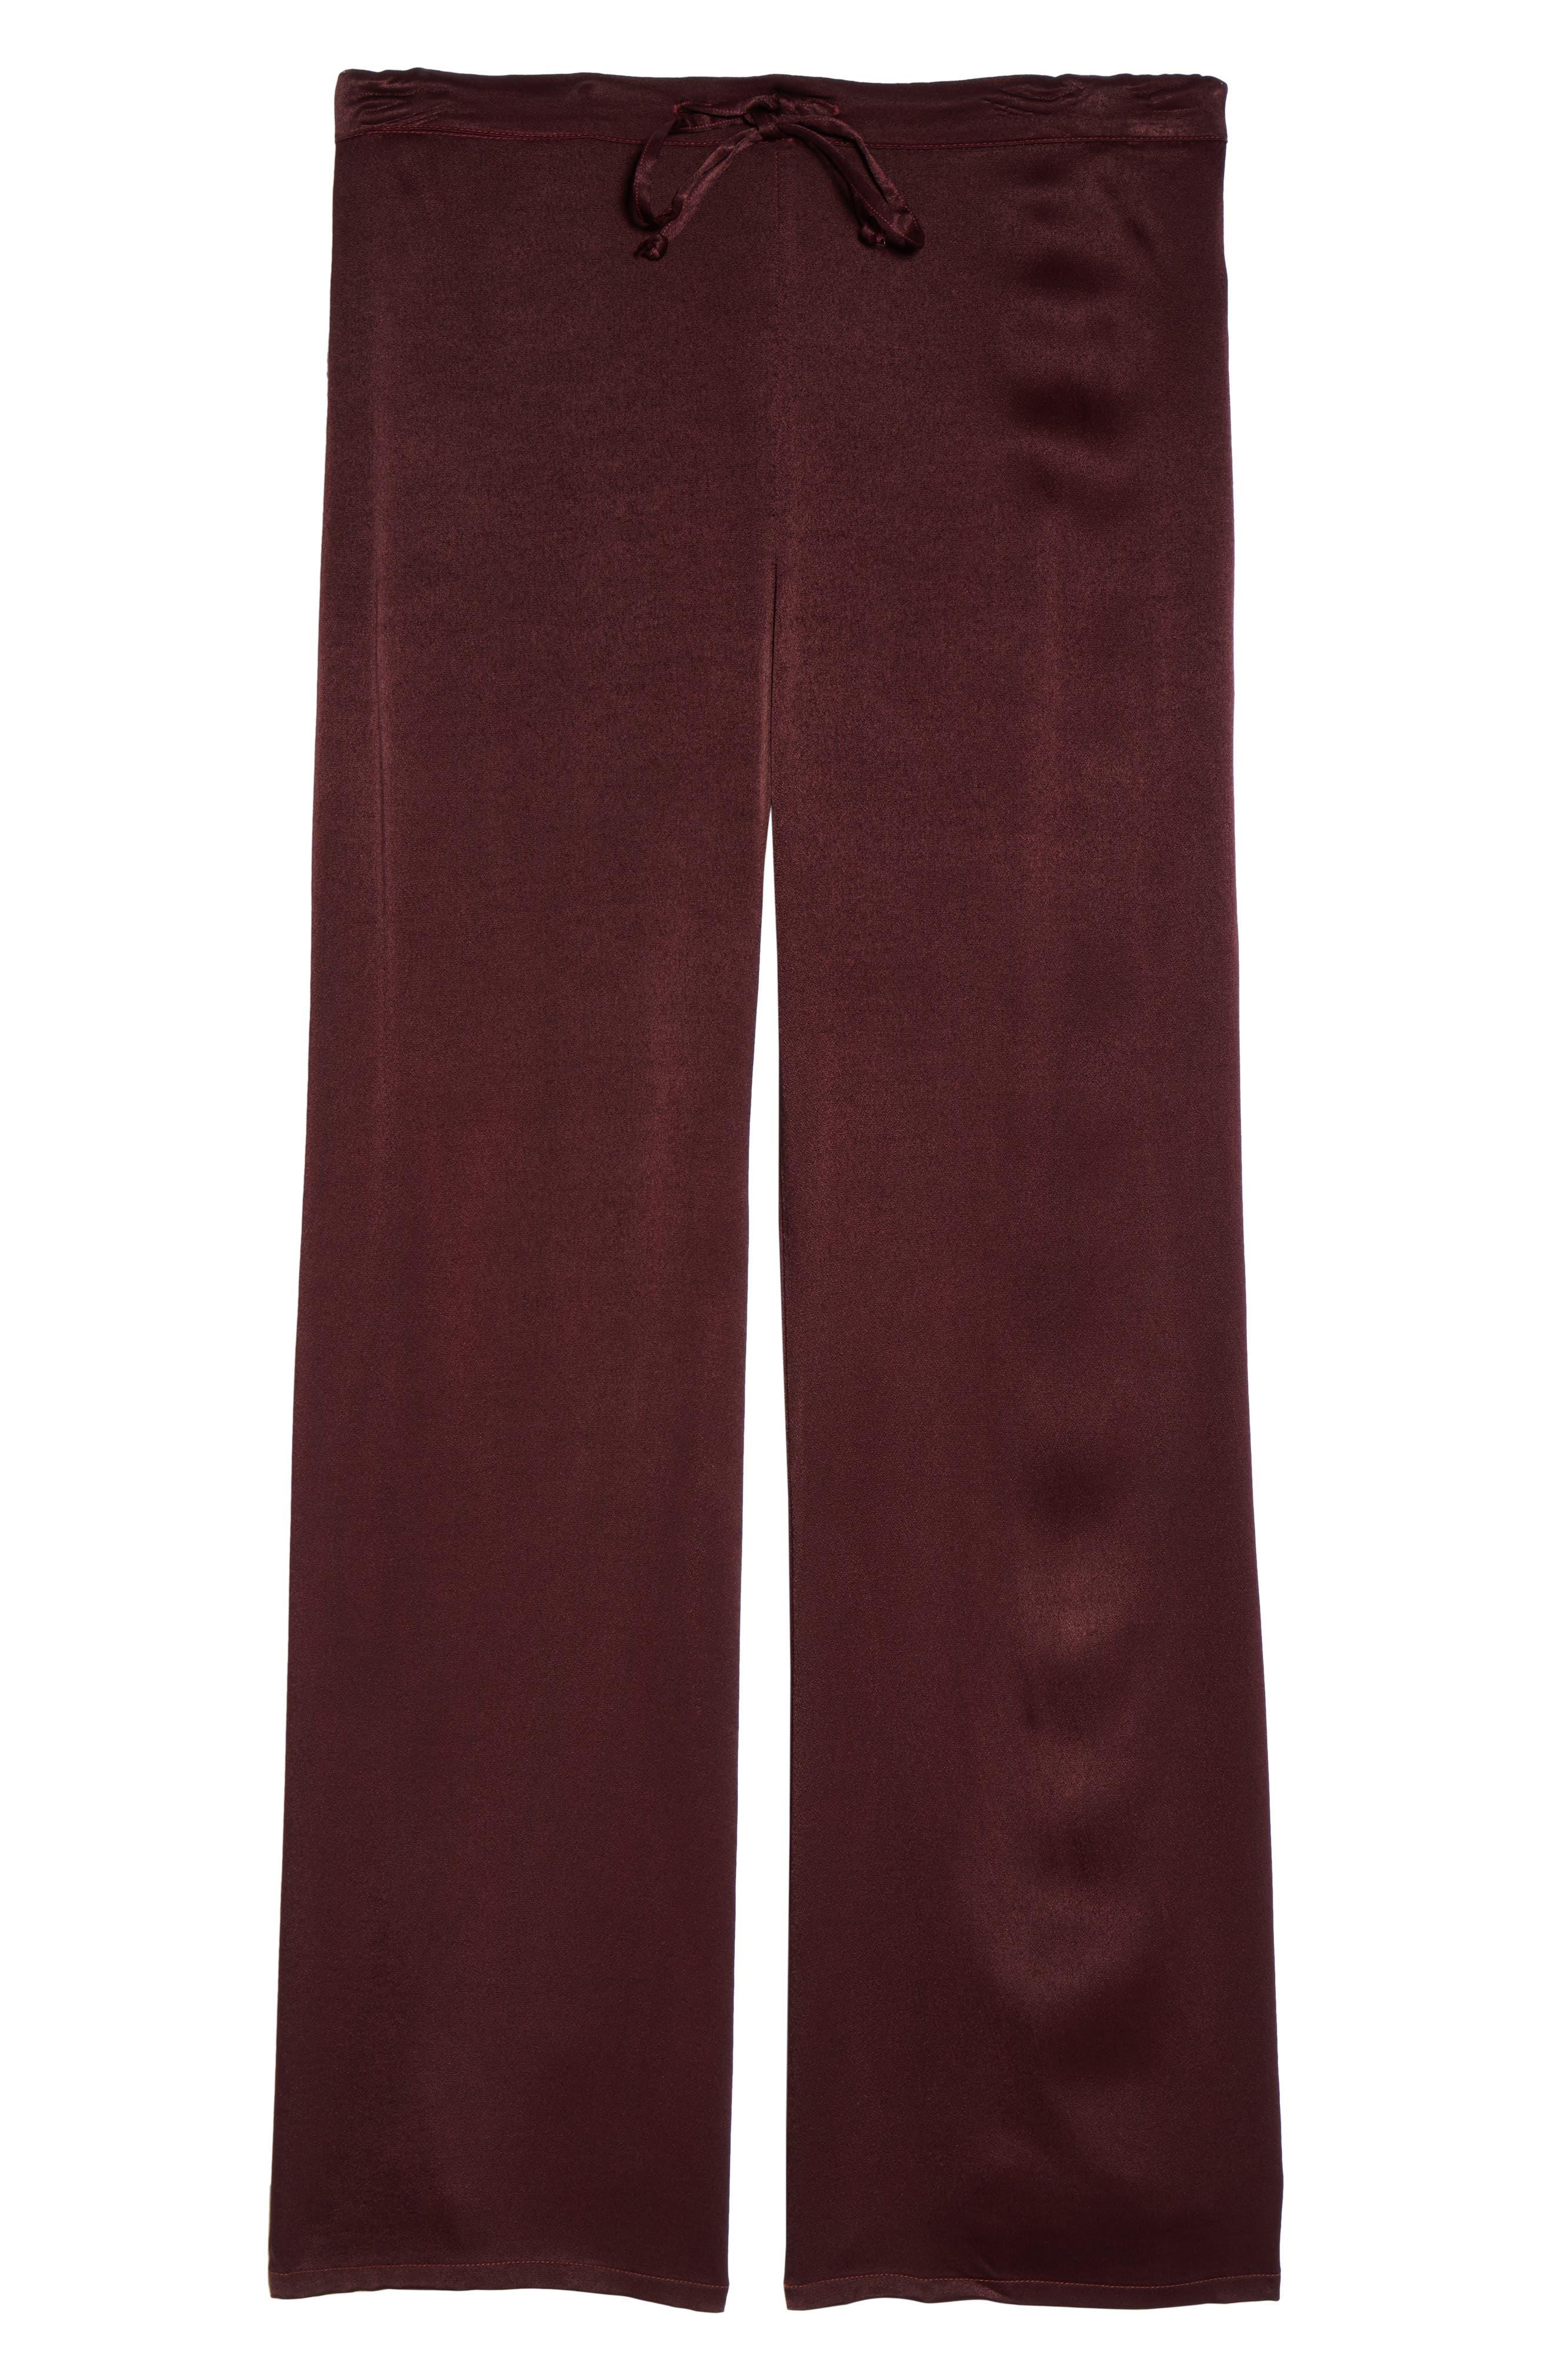 Vela Pajama Pants,                             Alternate thumbnail 12, color,